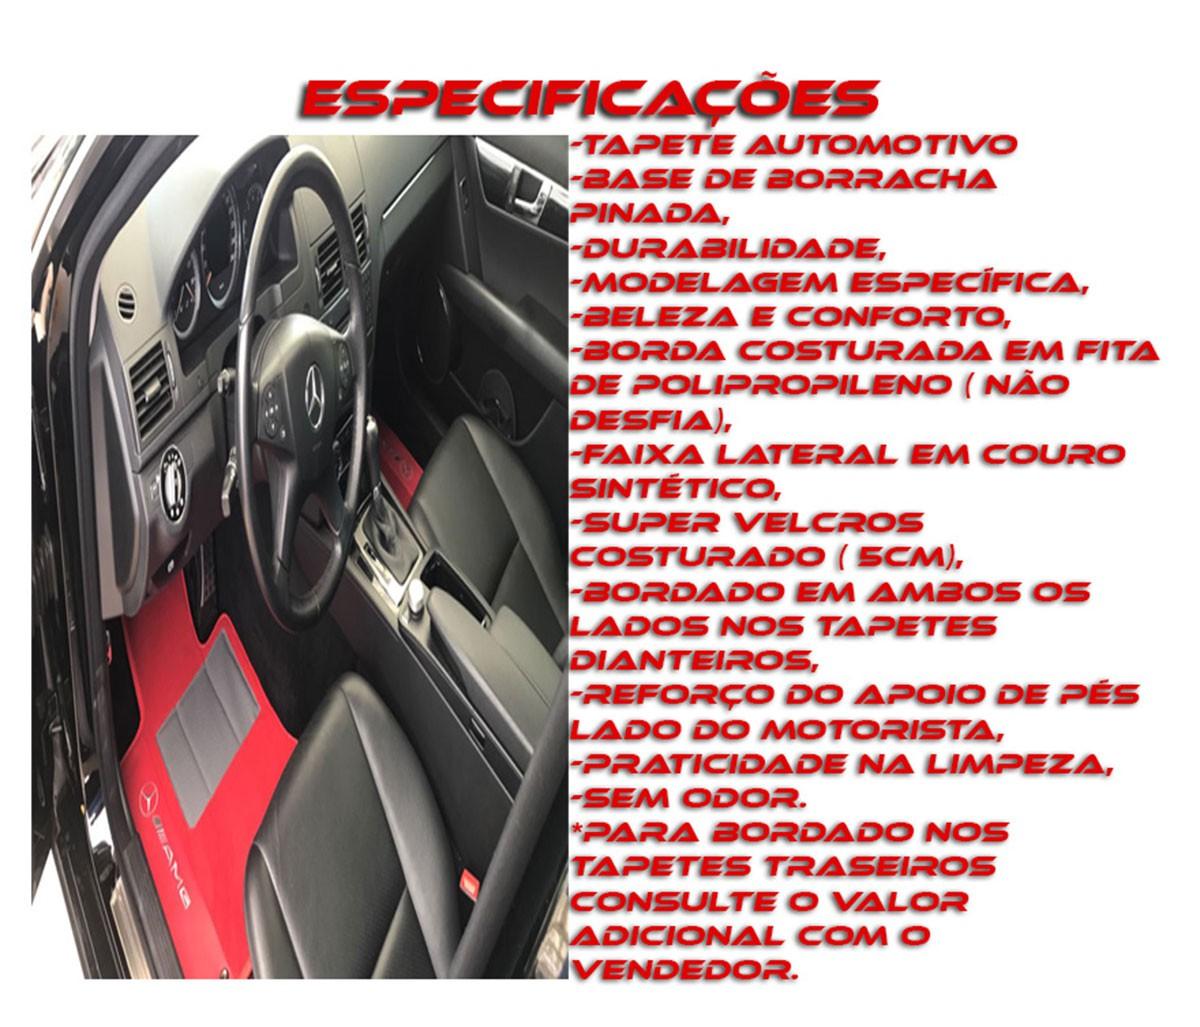 Tapete Astra Wagon Importado Carpete Luxo Base Pinada Hitto!